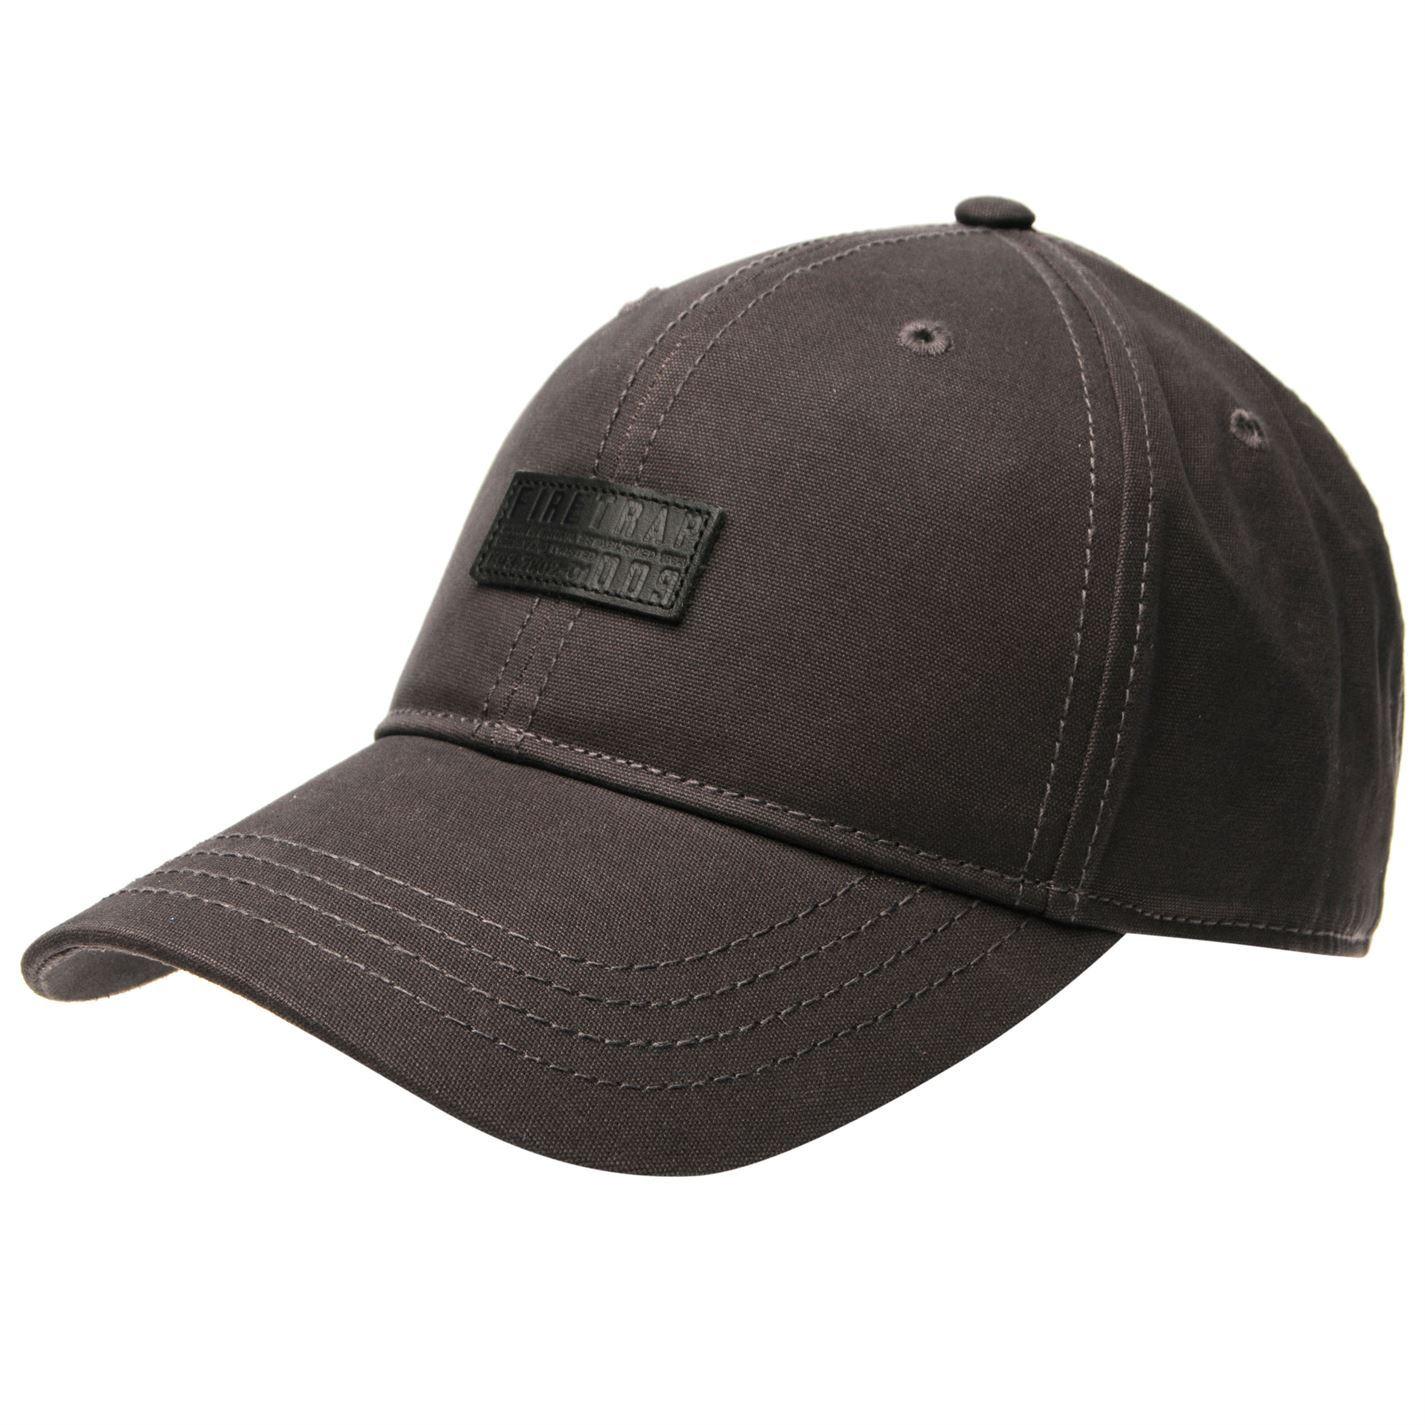 Firetrap Mens Woven Baseball Cap Hat Arched Curved Peak Headwear Accessories d6900177bb1